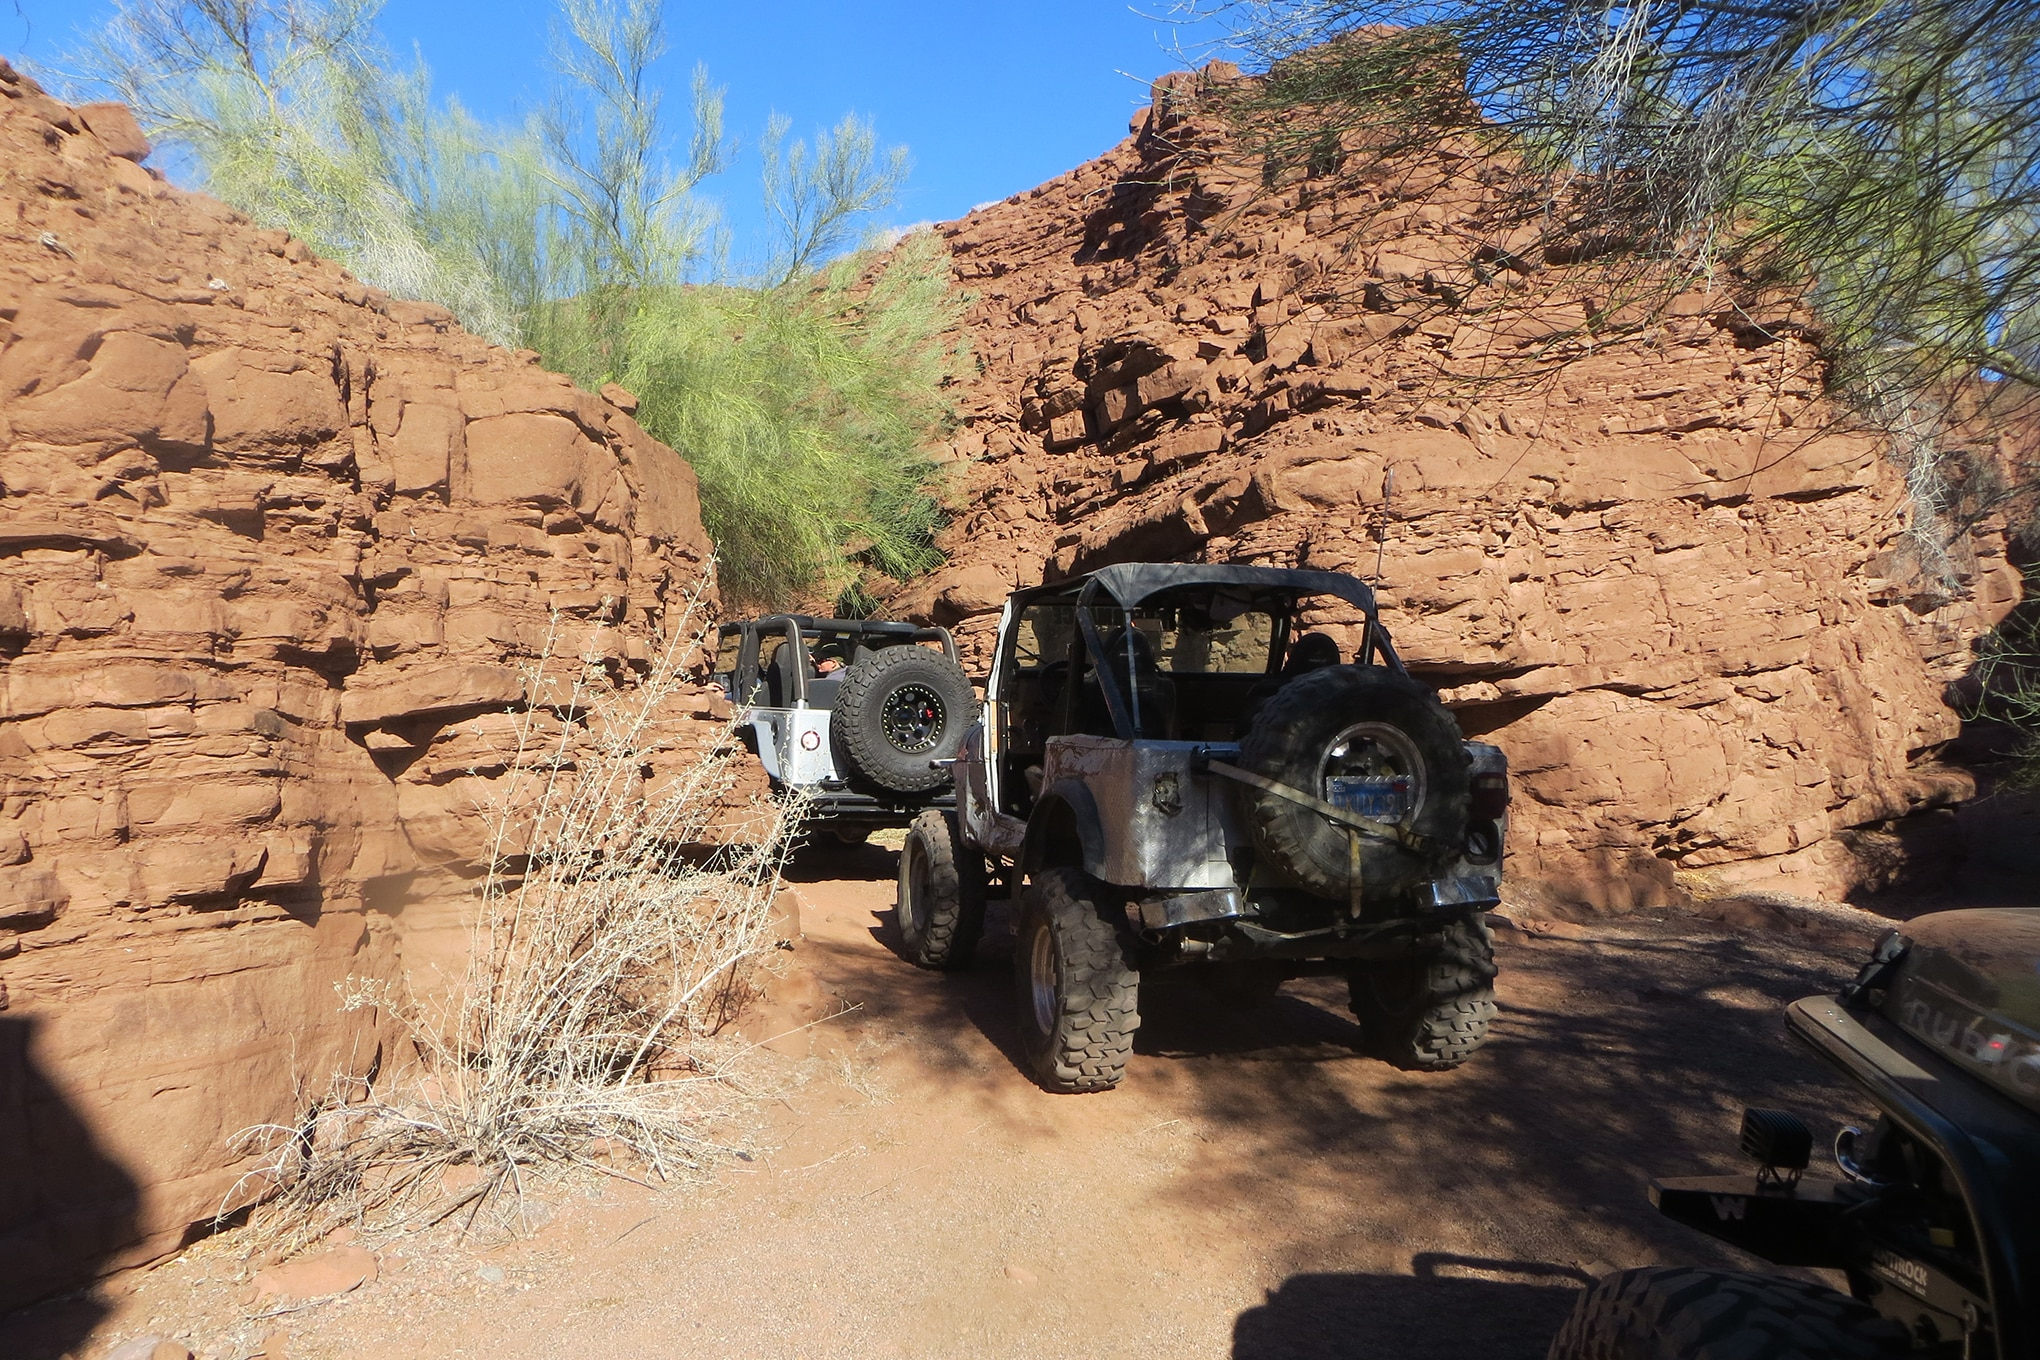 016 2015 desert splash snake bite carnage canyon